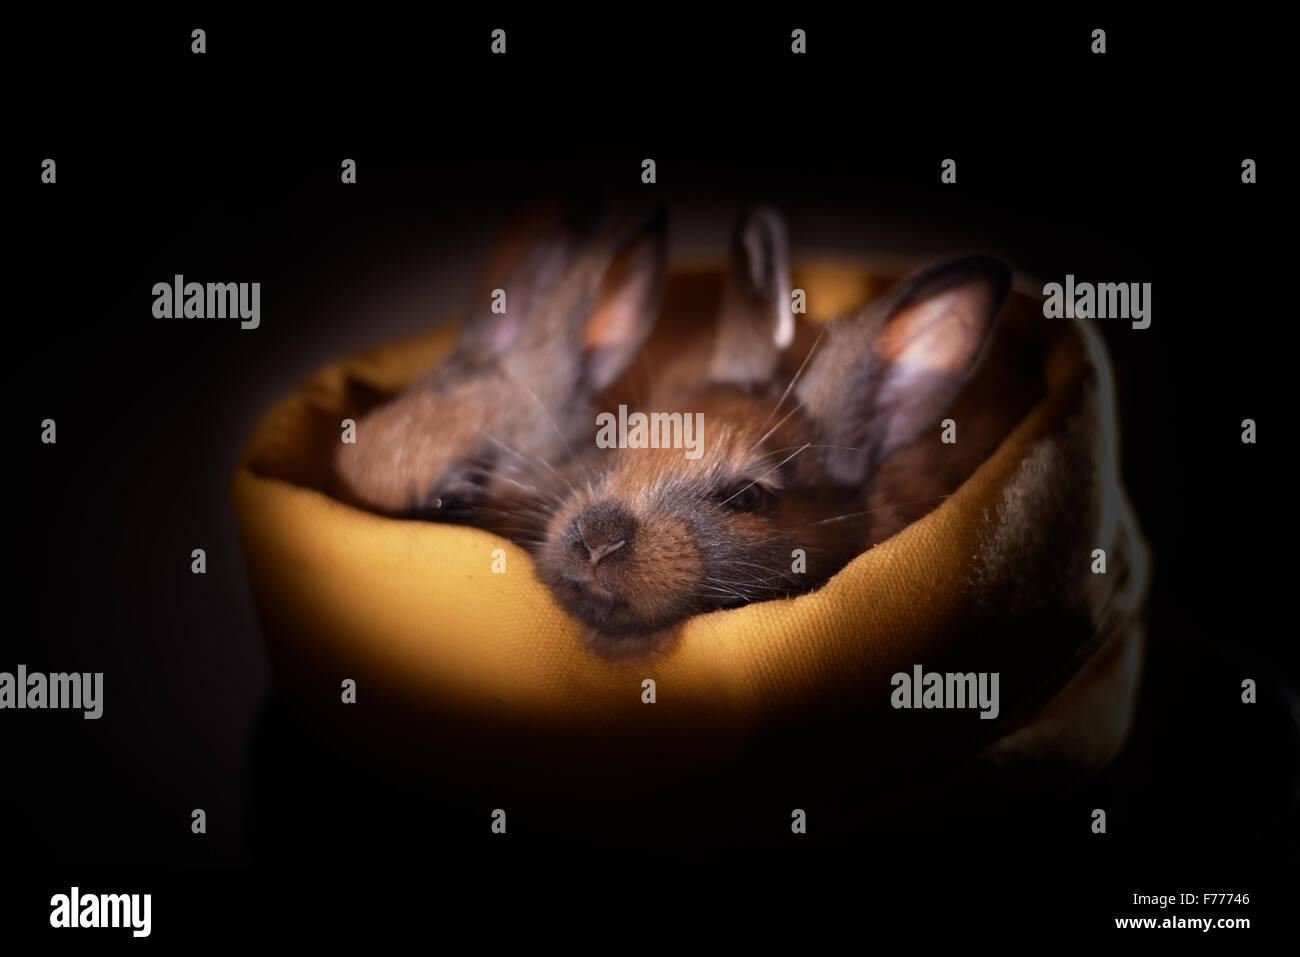 cute little bunnies - Stock Image